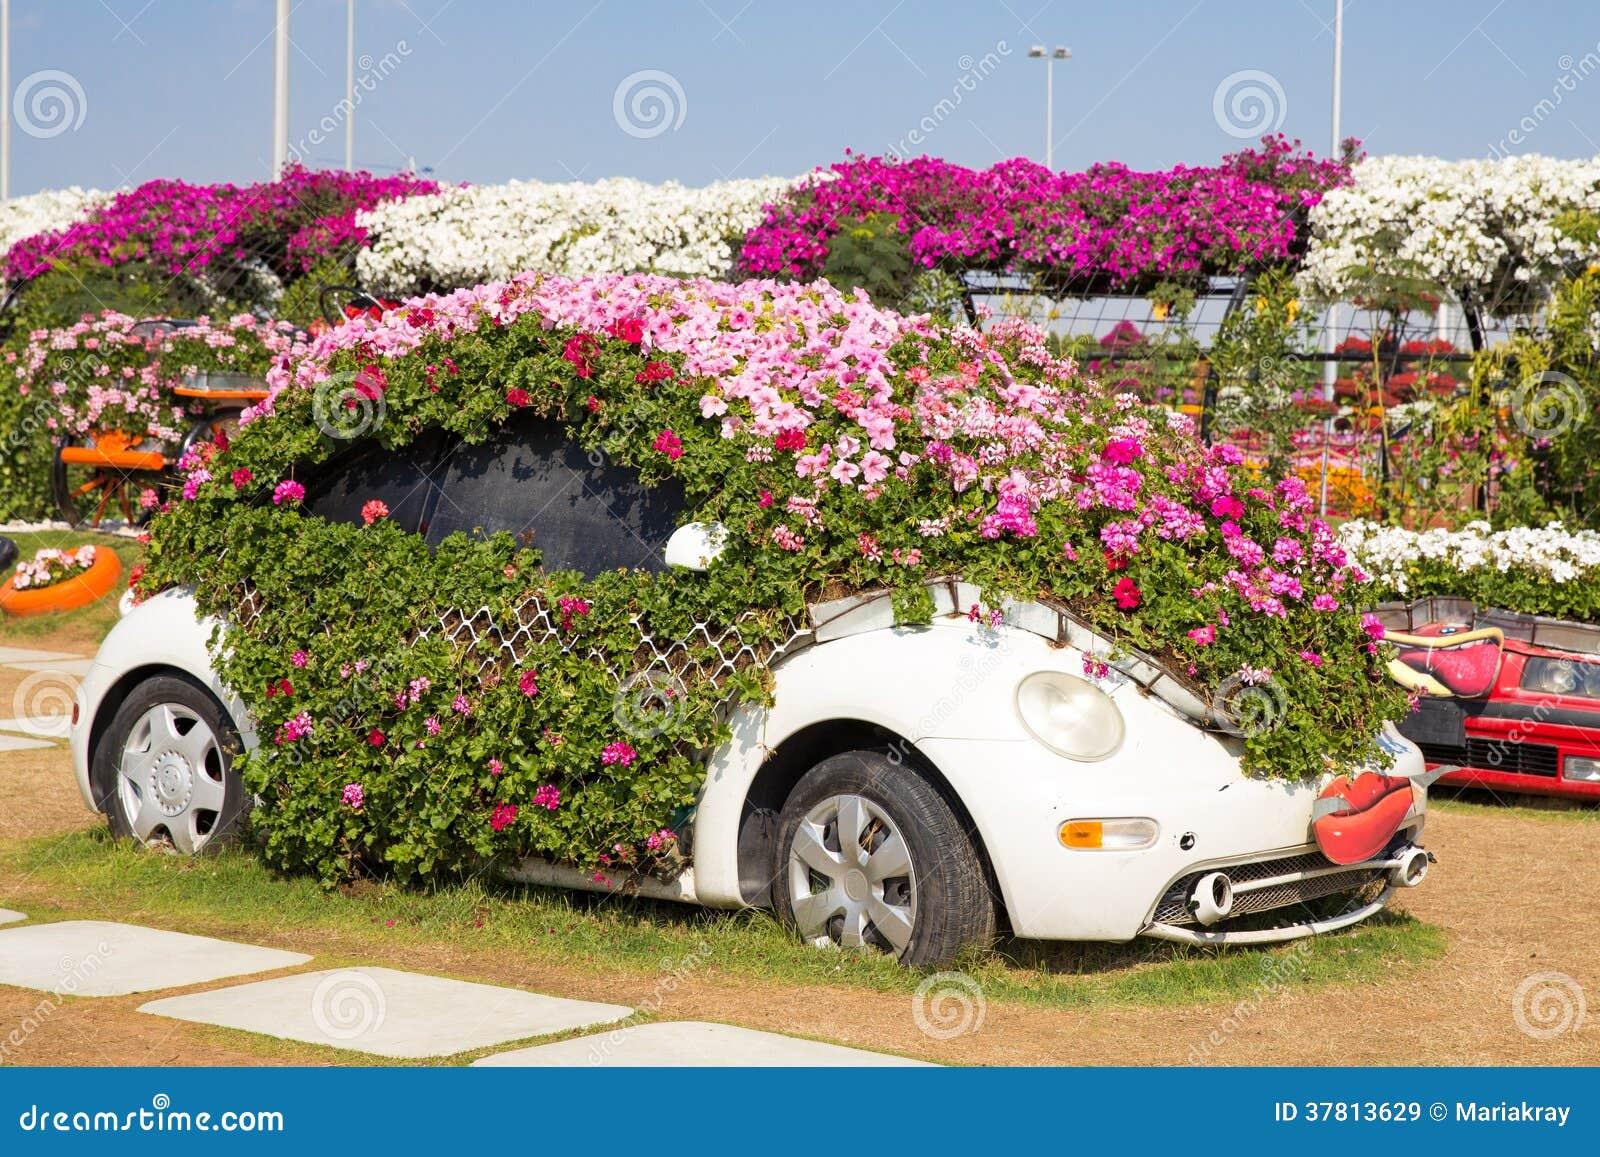 Dubai Uae January 20 Miracle Garden In Dubai On January 20 Editorial Stock Image Image